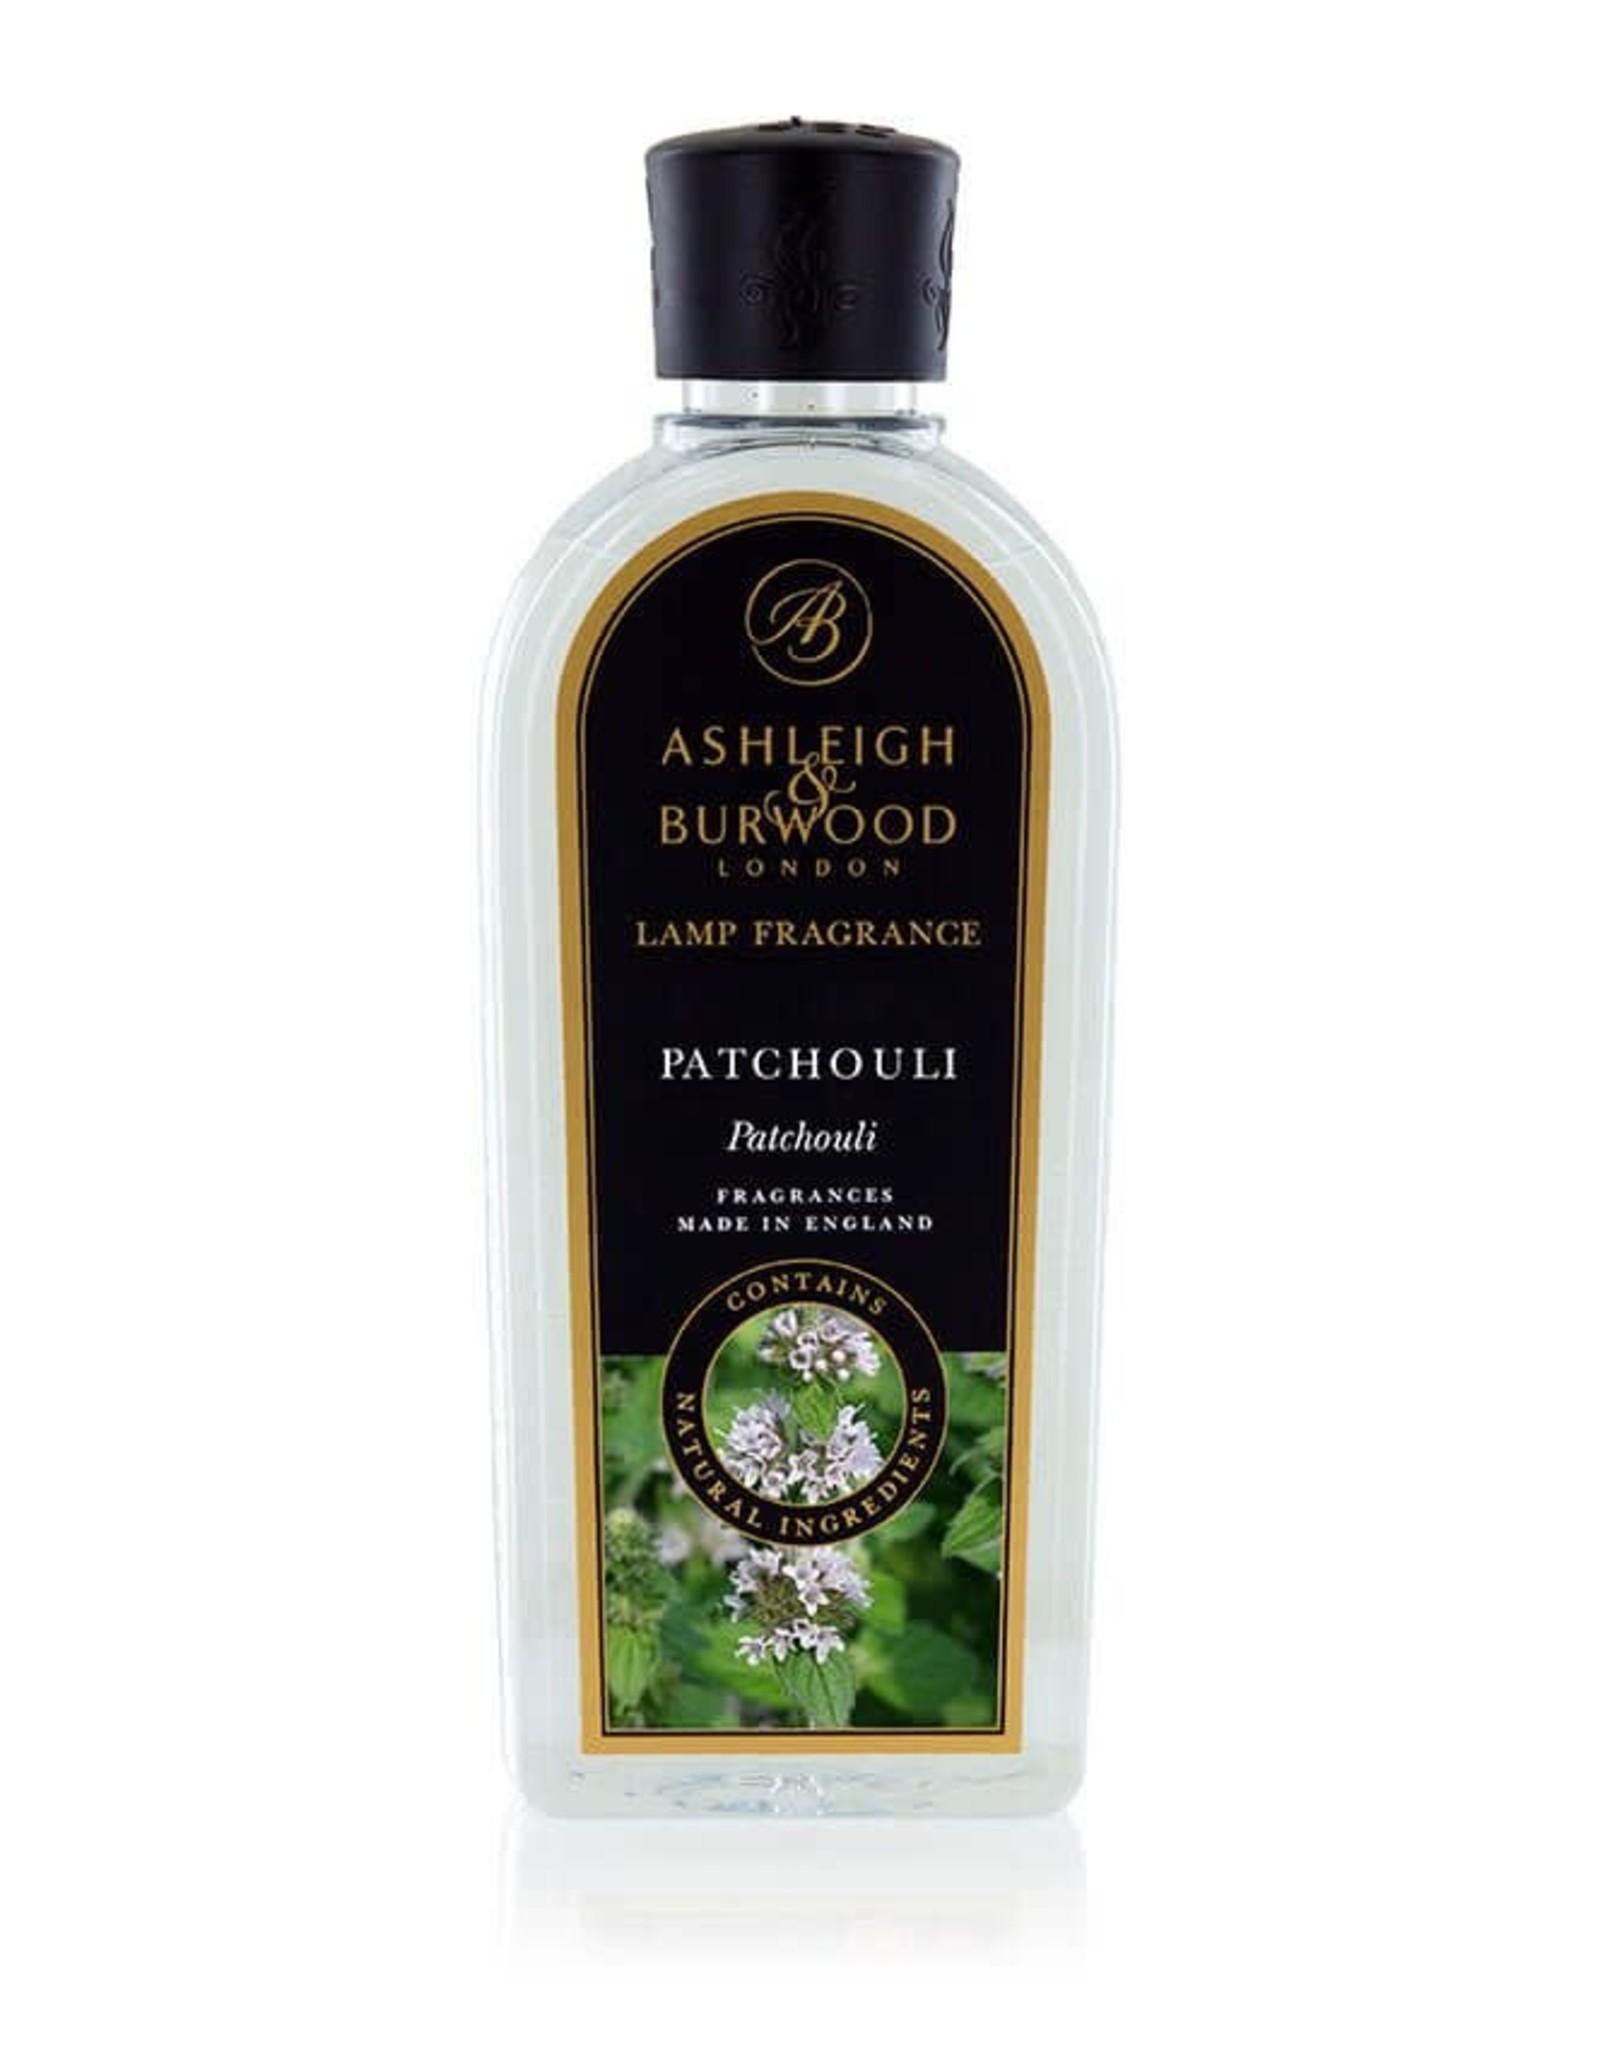 Ashleigh & Burwood Patchouli 250ml Geurlampolie - Ashleigh & Burwood